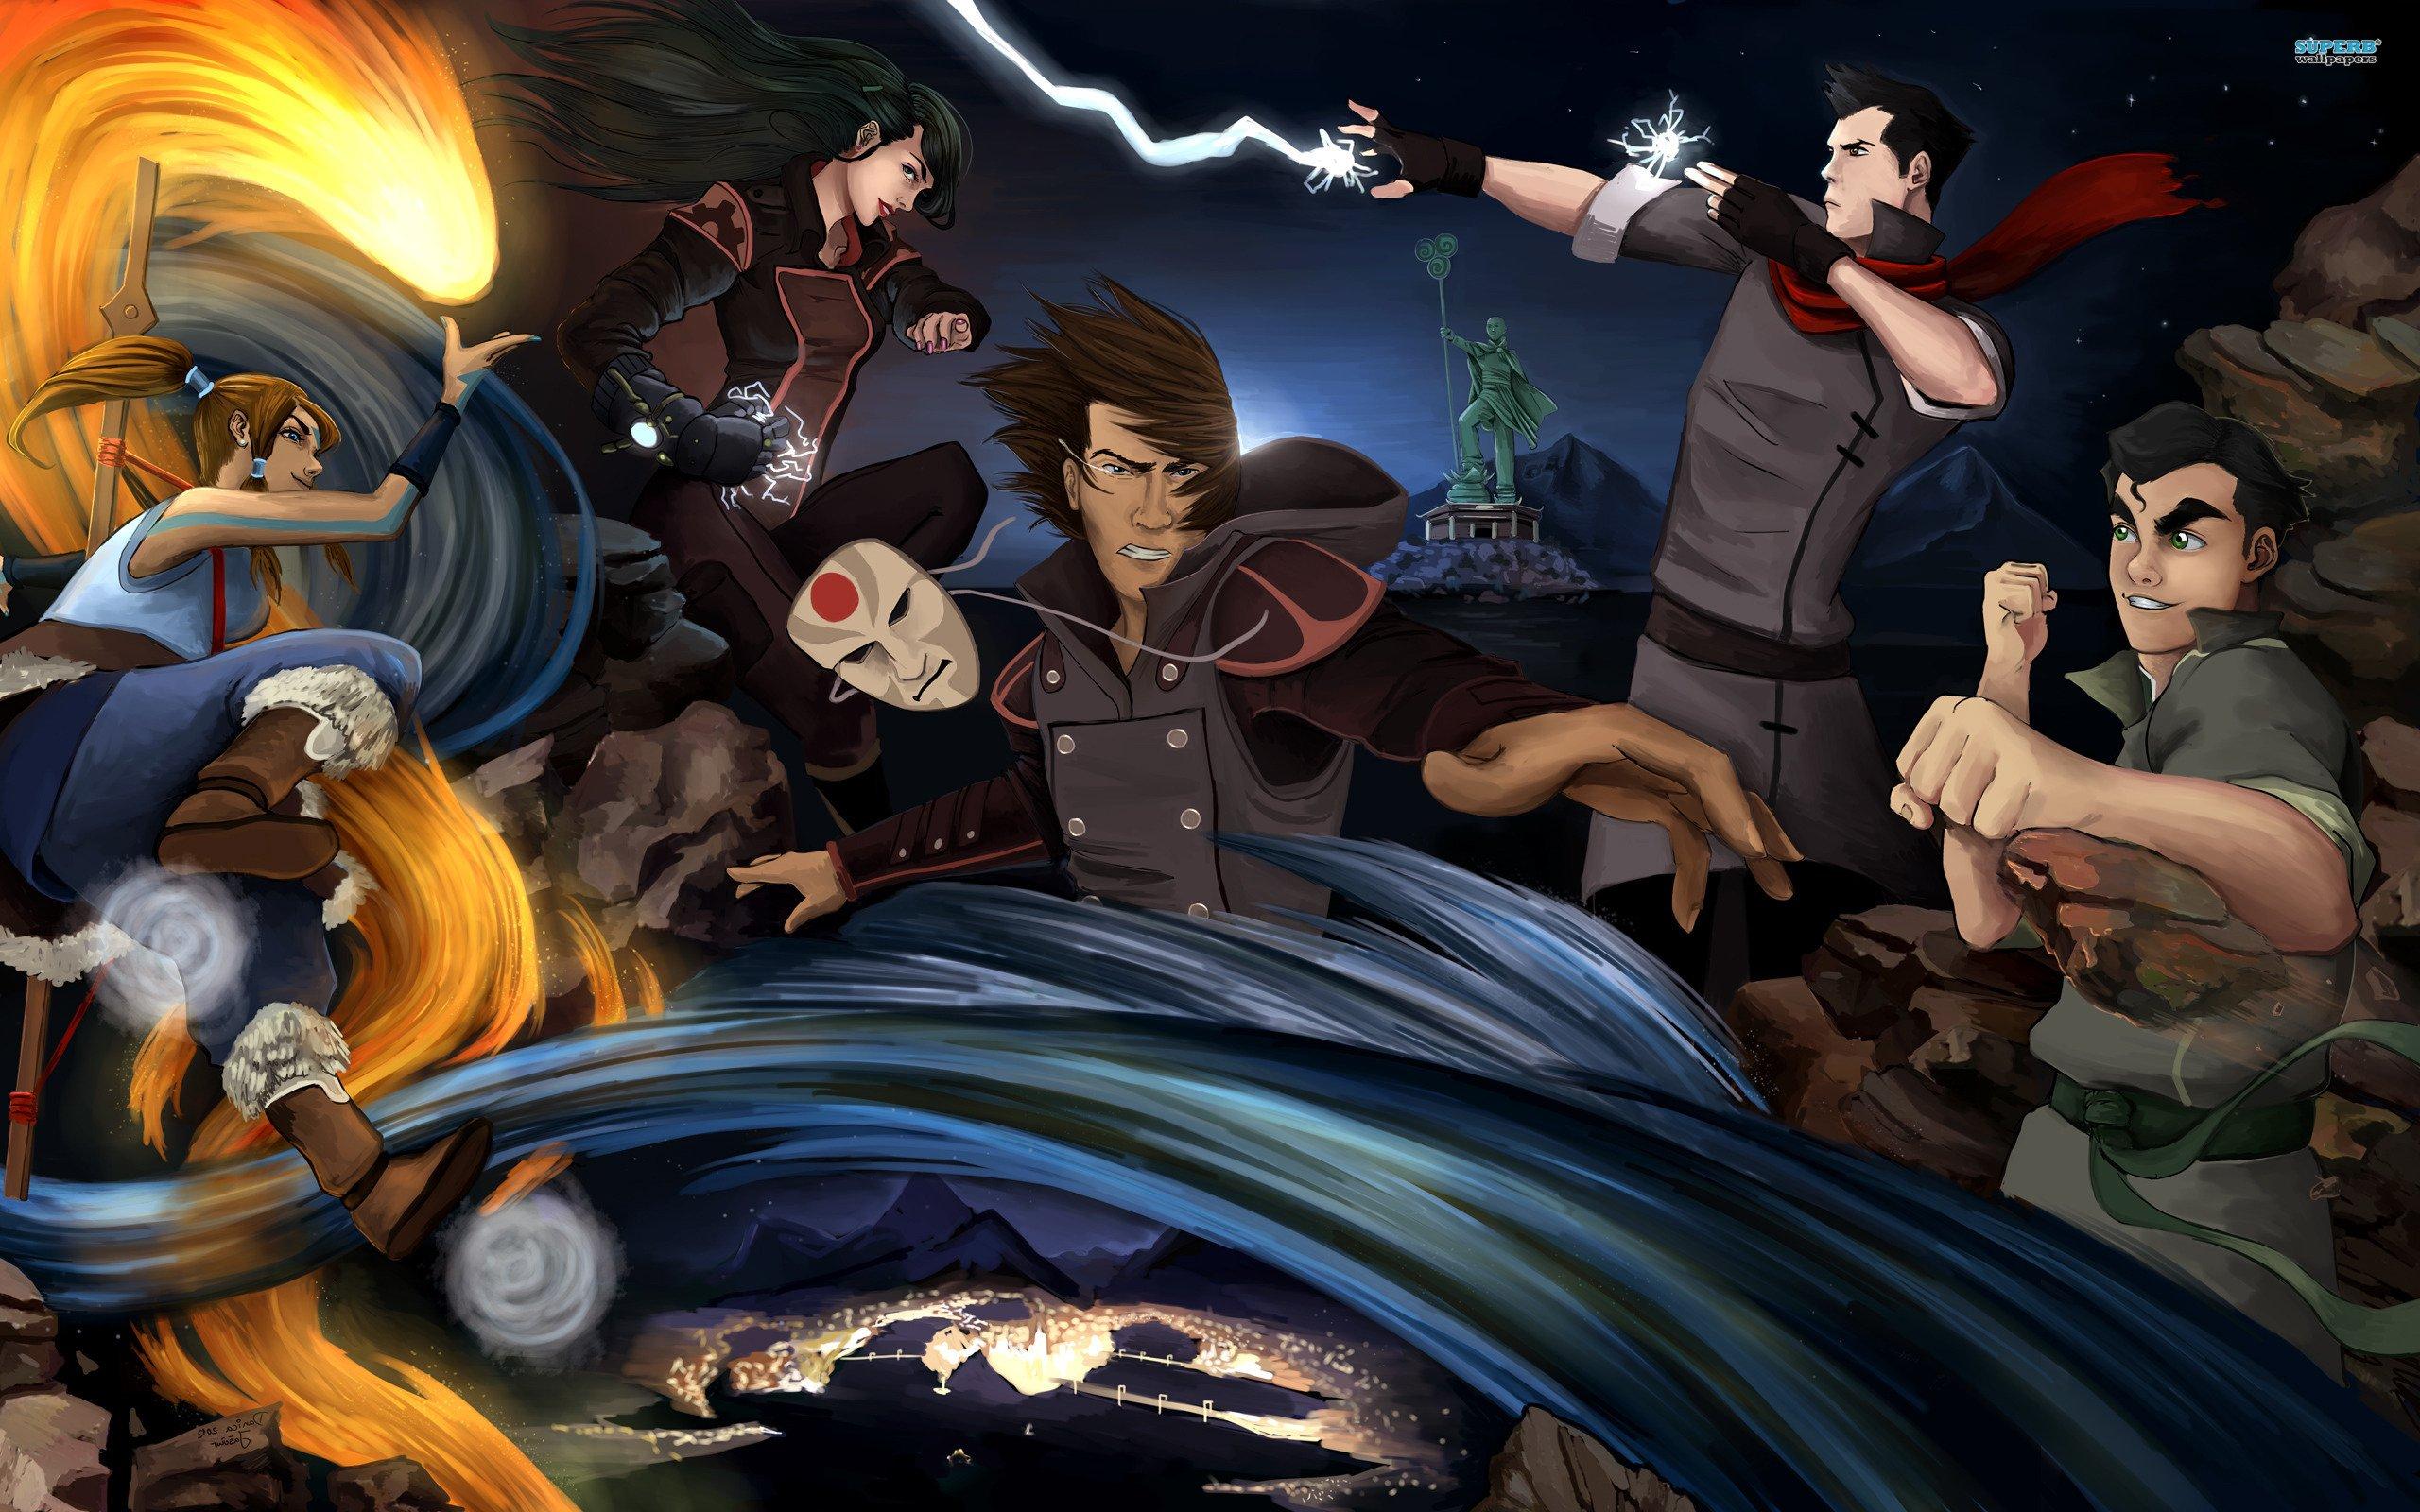 Avatar The Legend Of Korra Characters Wallpaper HD 2560x1600